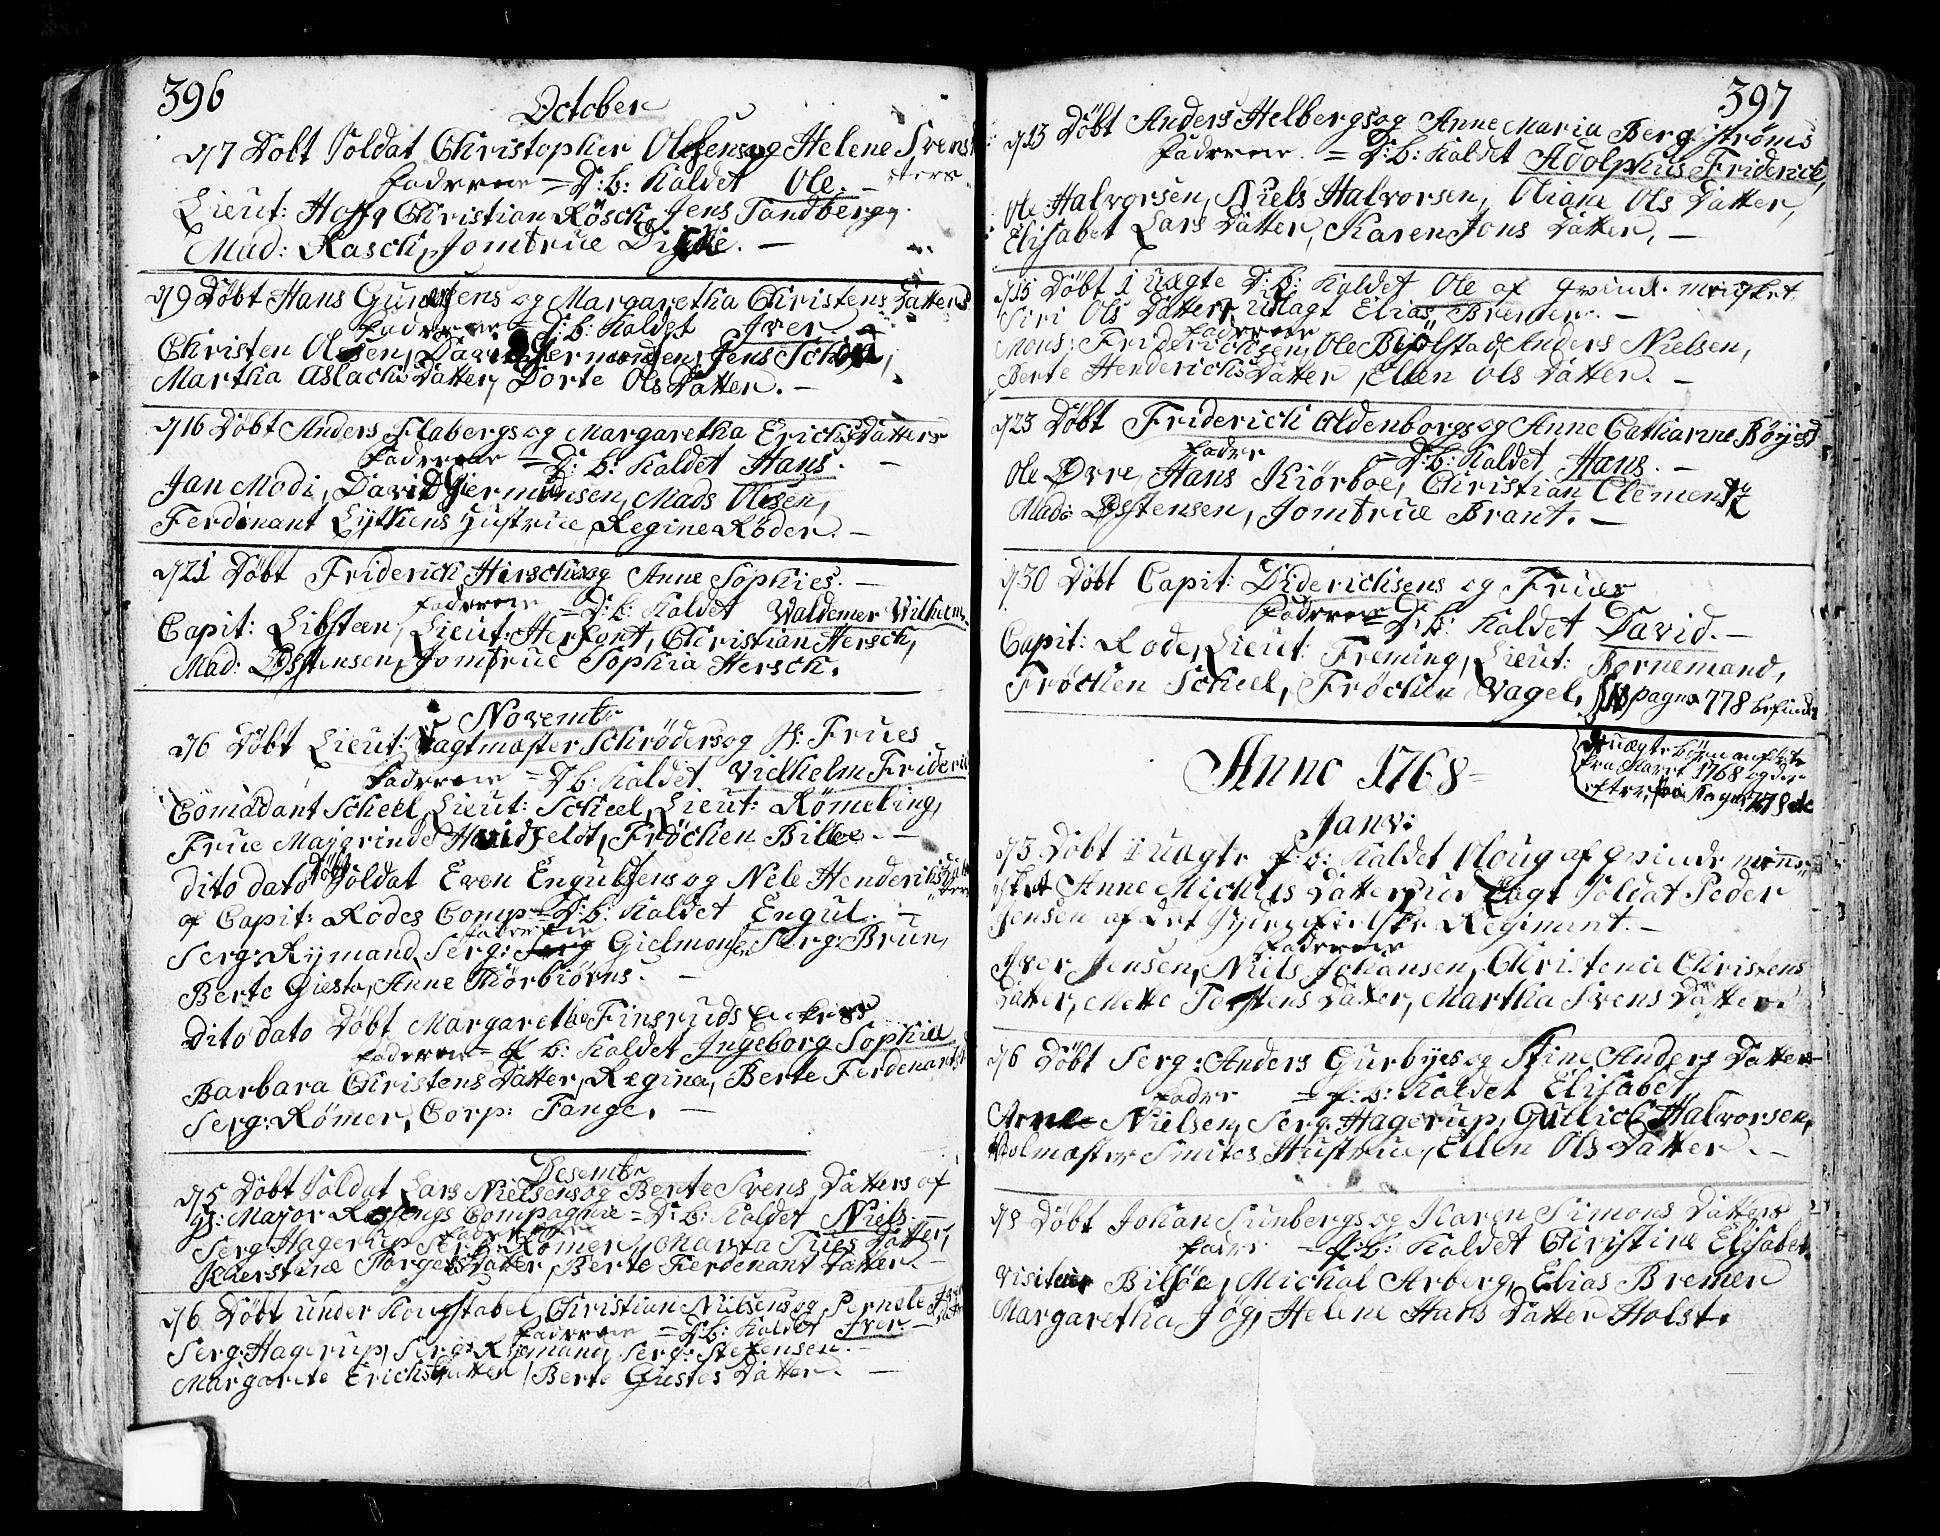 SAO, Fredrikstad prestekontor Kirkebøker, F/Fa/L0002: Ministerialbok nr. 2, 1750-1804, s. 396-397